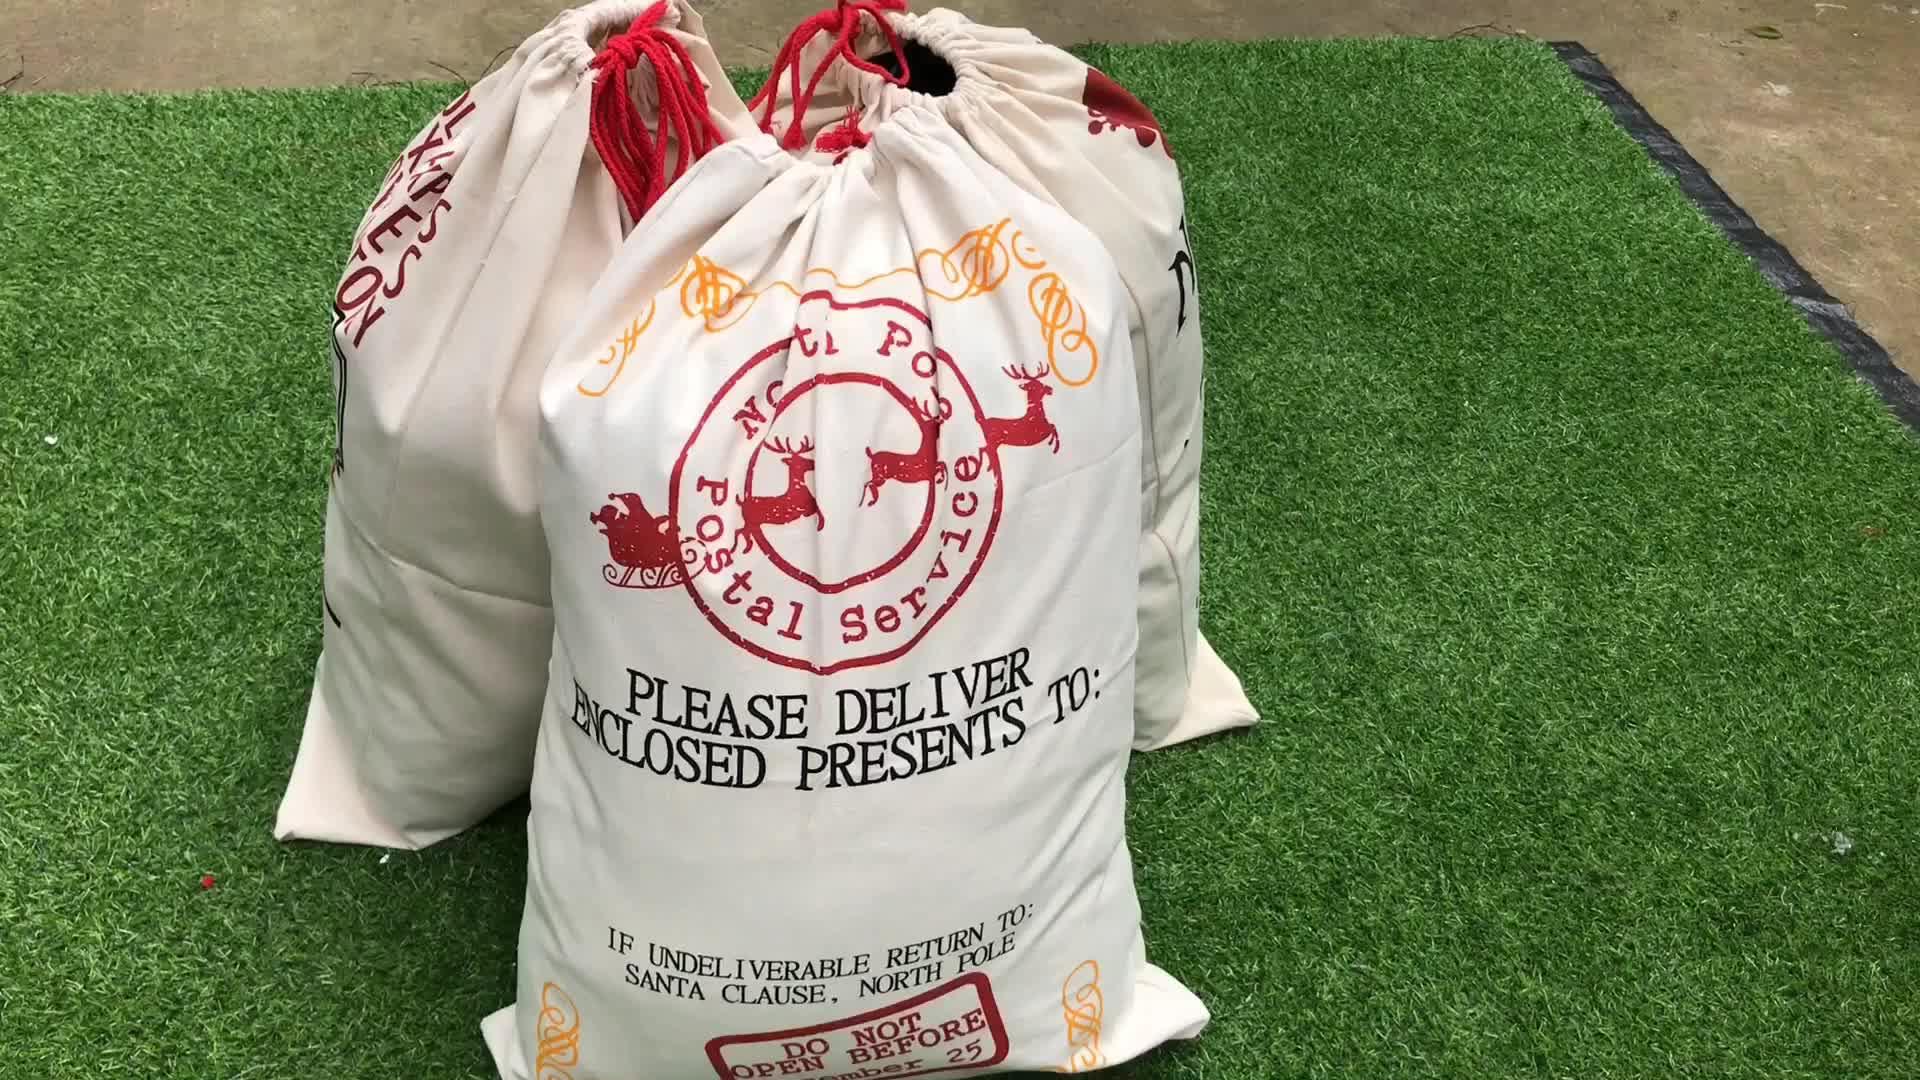 2019 सबसे लोकप्रिय क्रिसमस उपहार बैग थोक व्यक्तिगत बड़े खाली कैनवास सांता बोरी